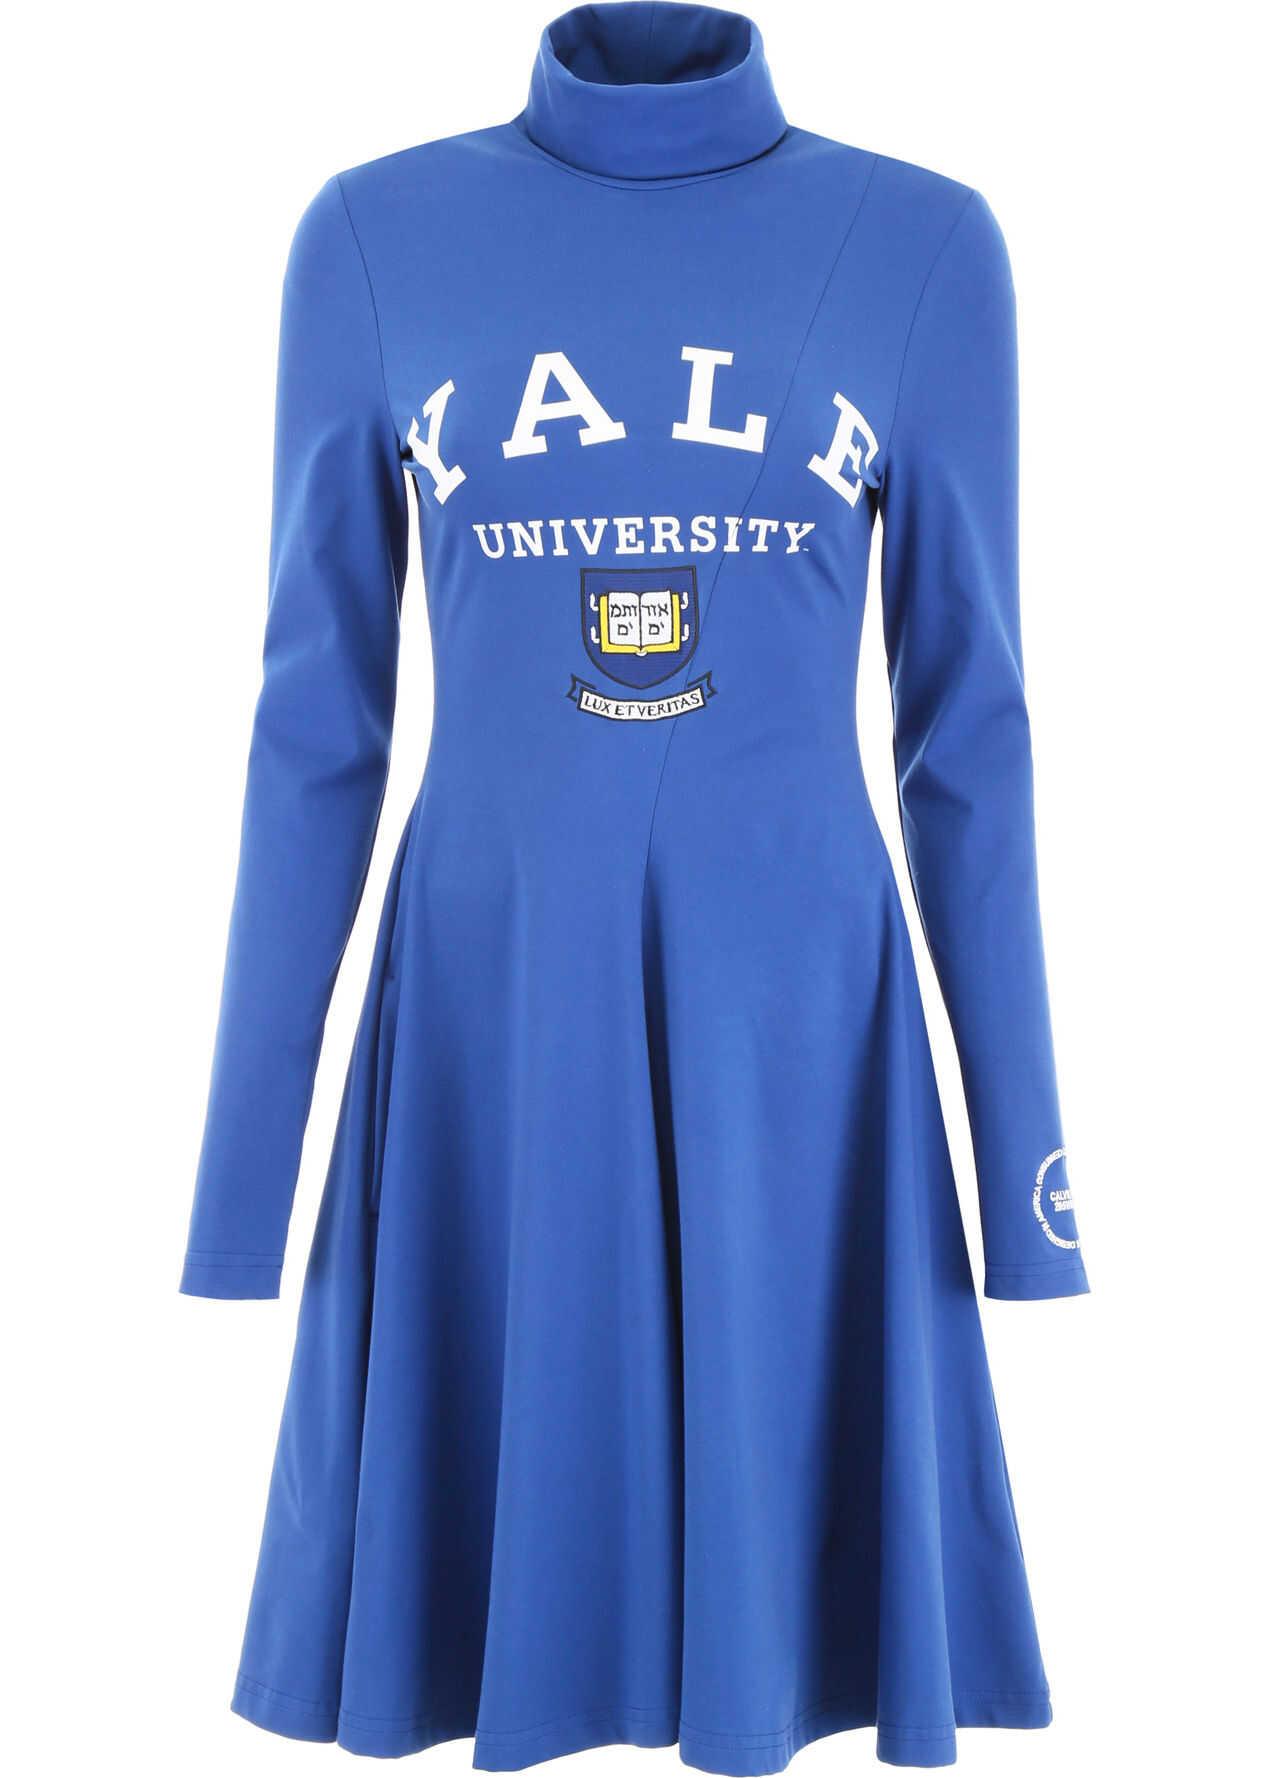 Calvin Klein 205W39NYC Yale University Dress YALE BLUE